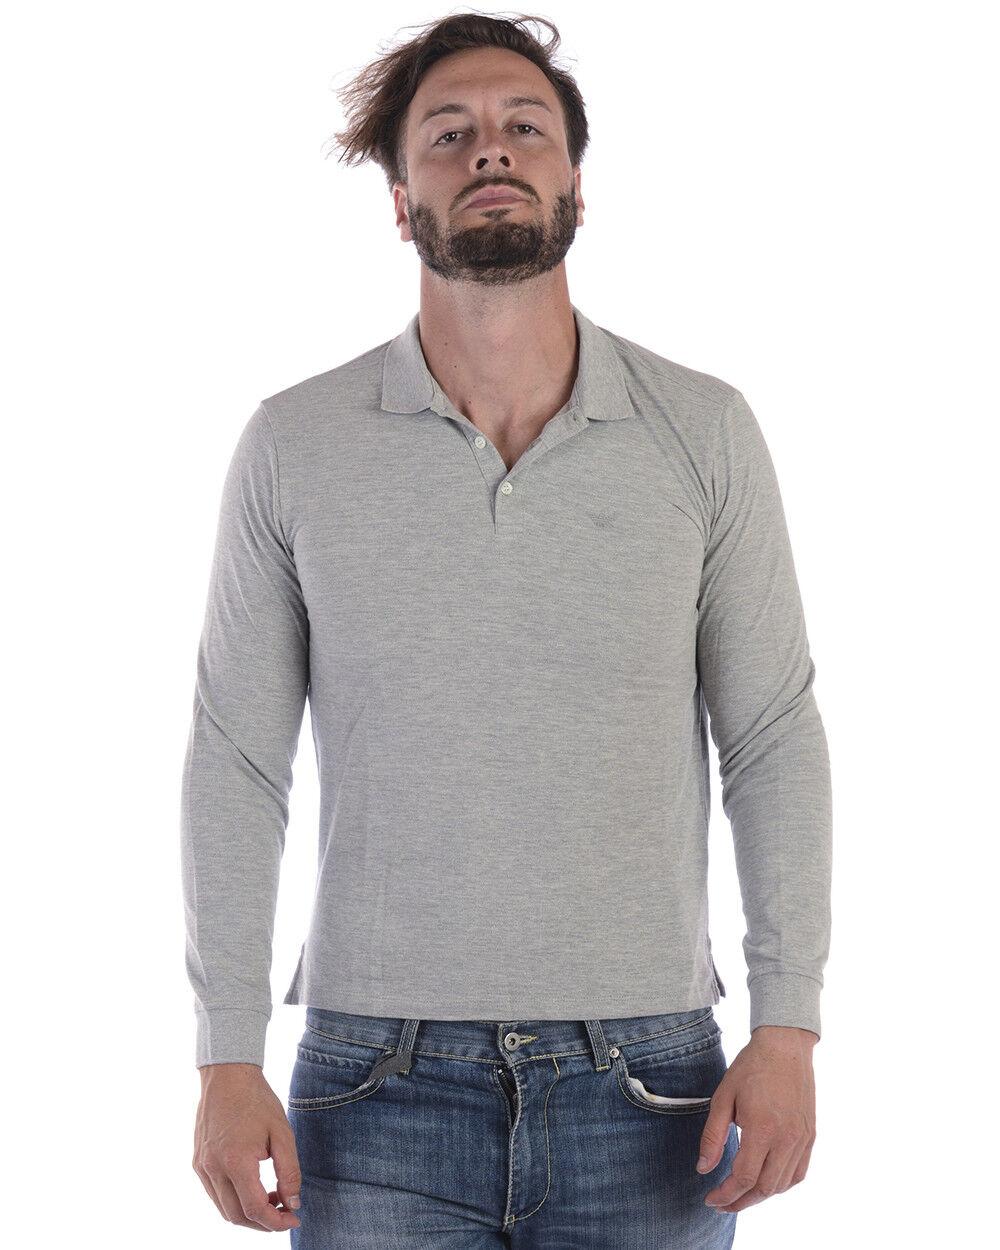 Polo Emporio Armani Shirt Cotone Uomo Grigio 8N1F131J0SZ 616